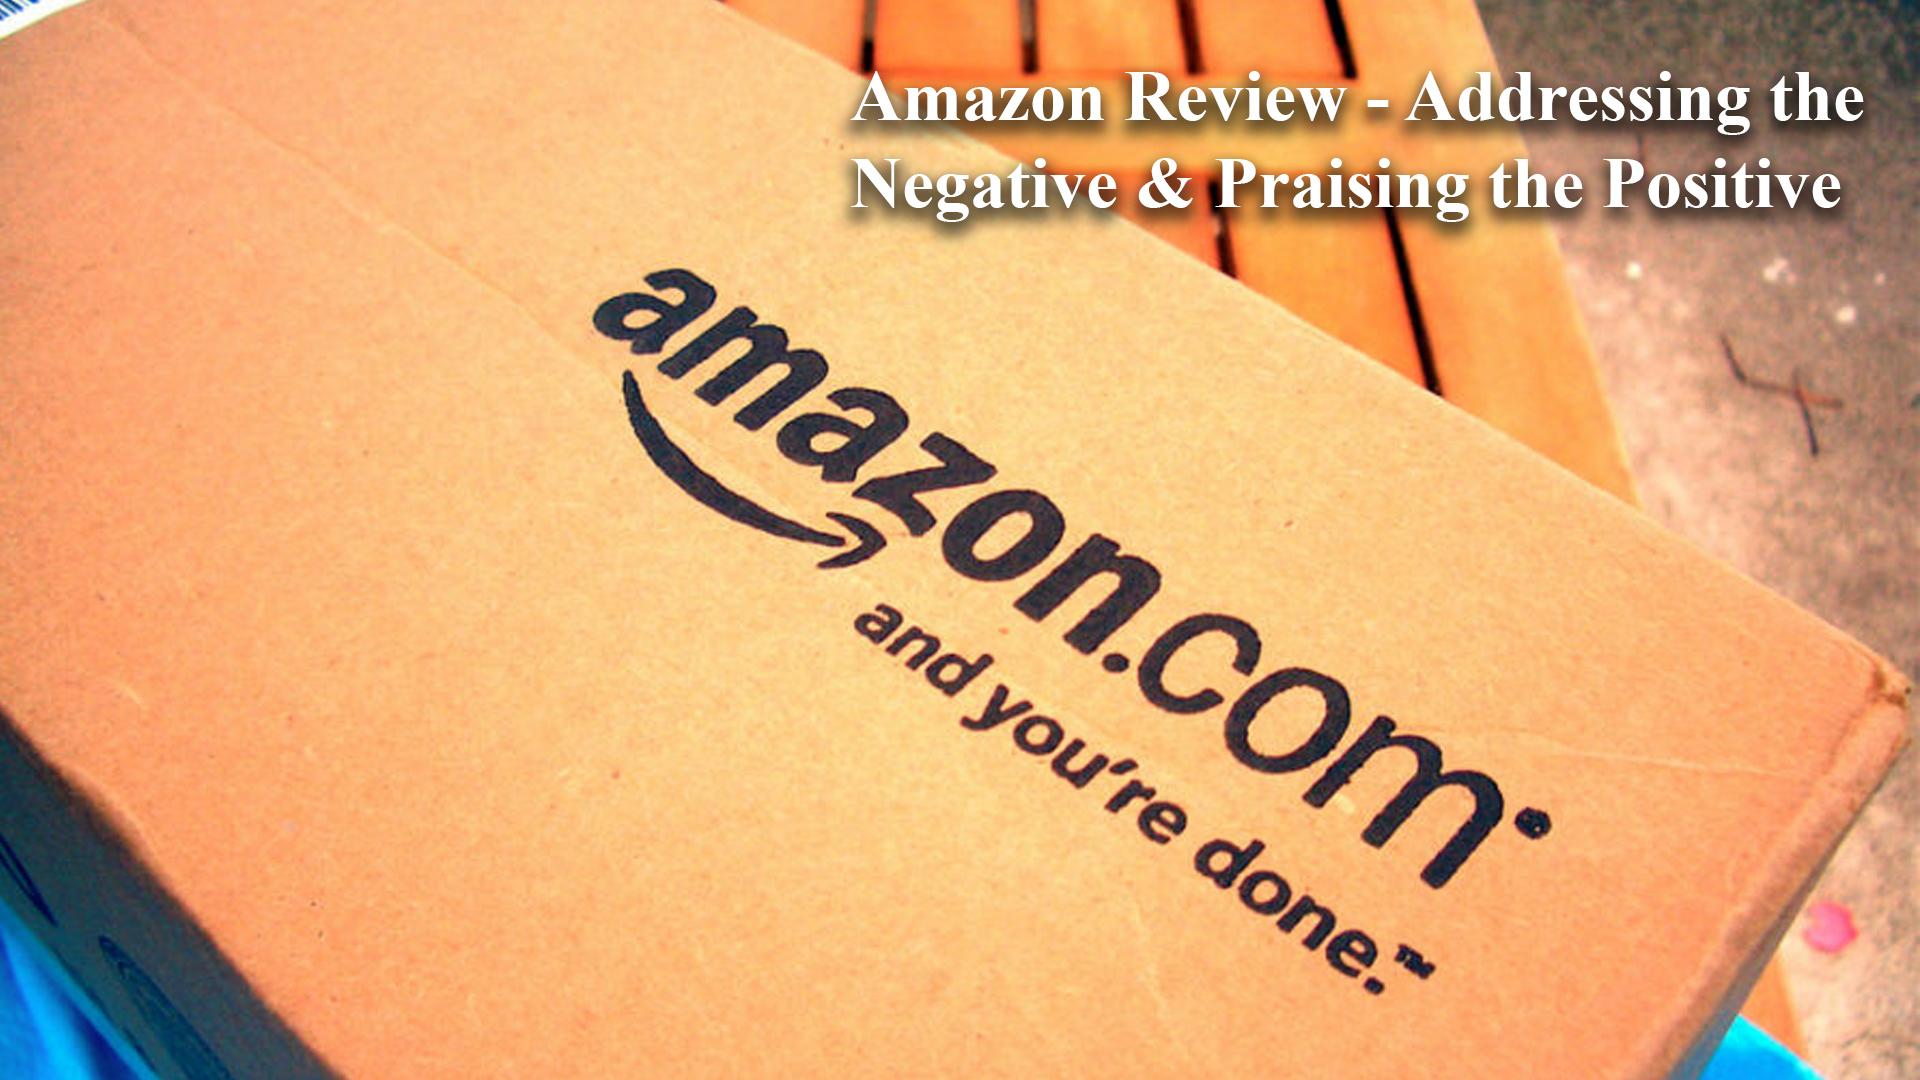 5 Ways to Get 5-Star Amazon Customer Reviews